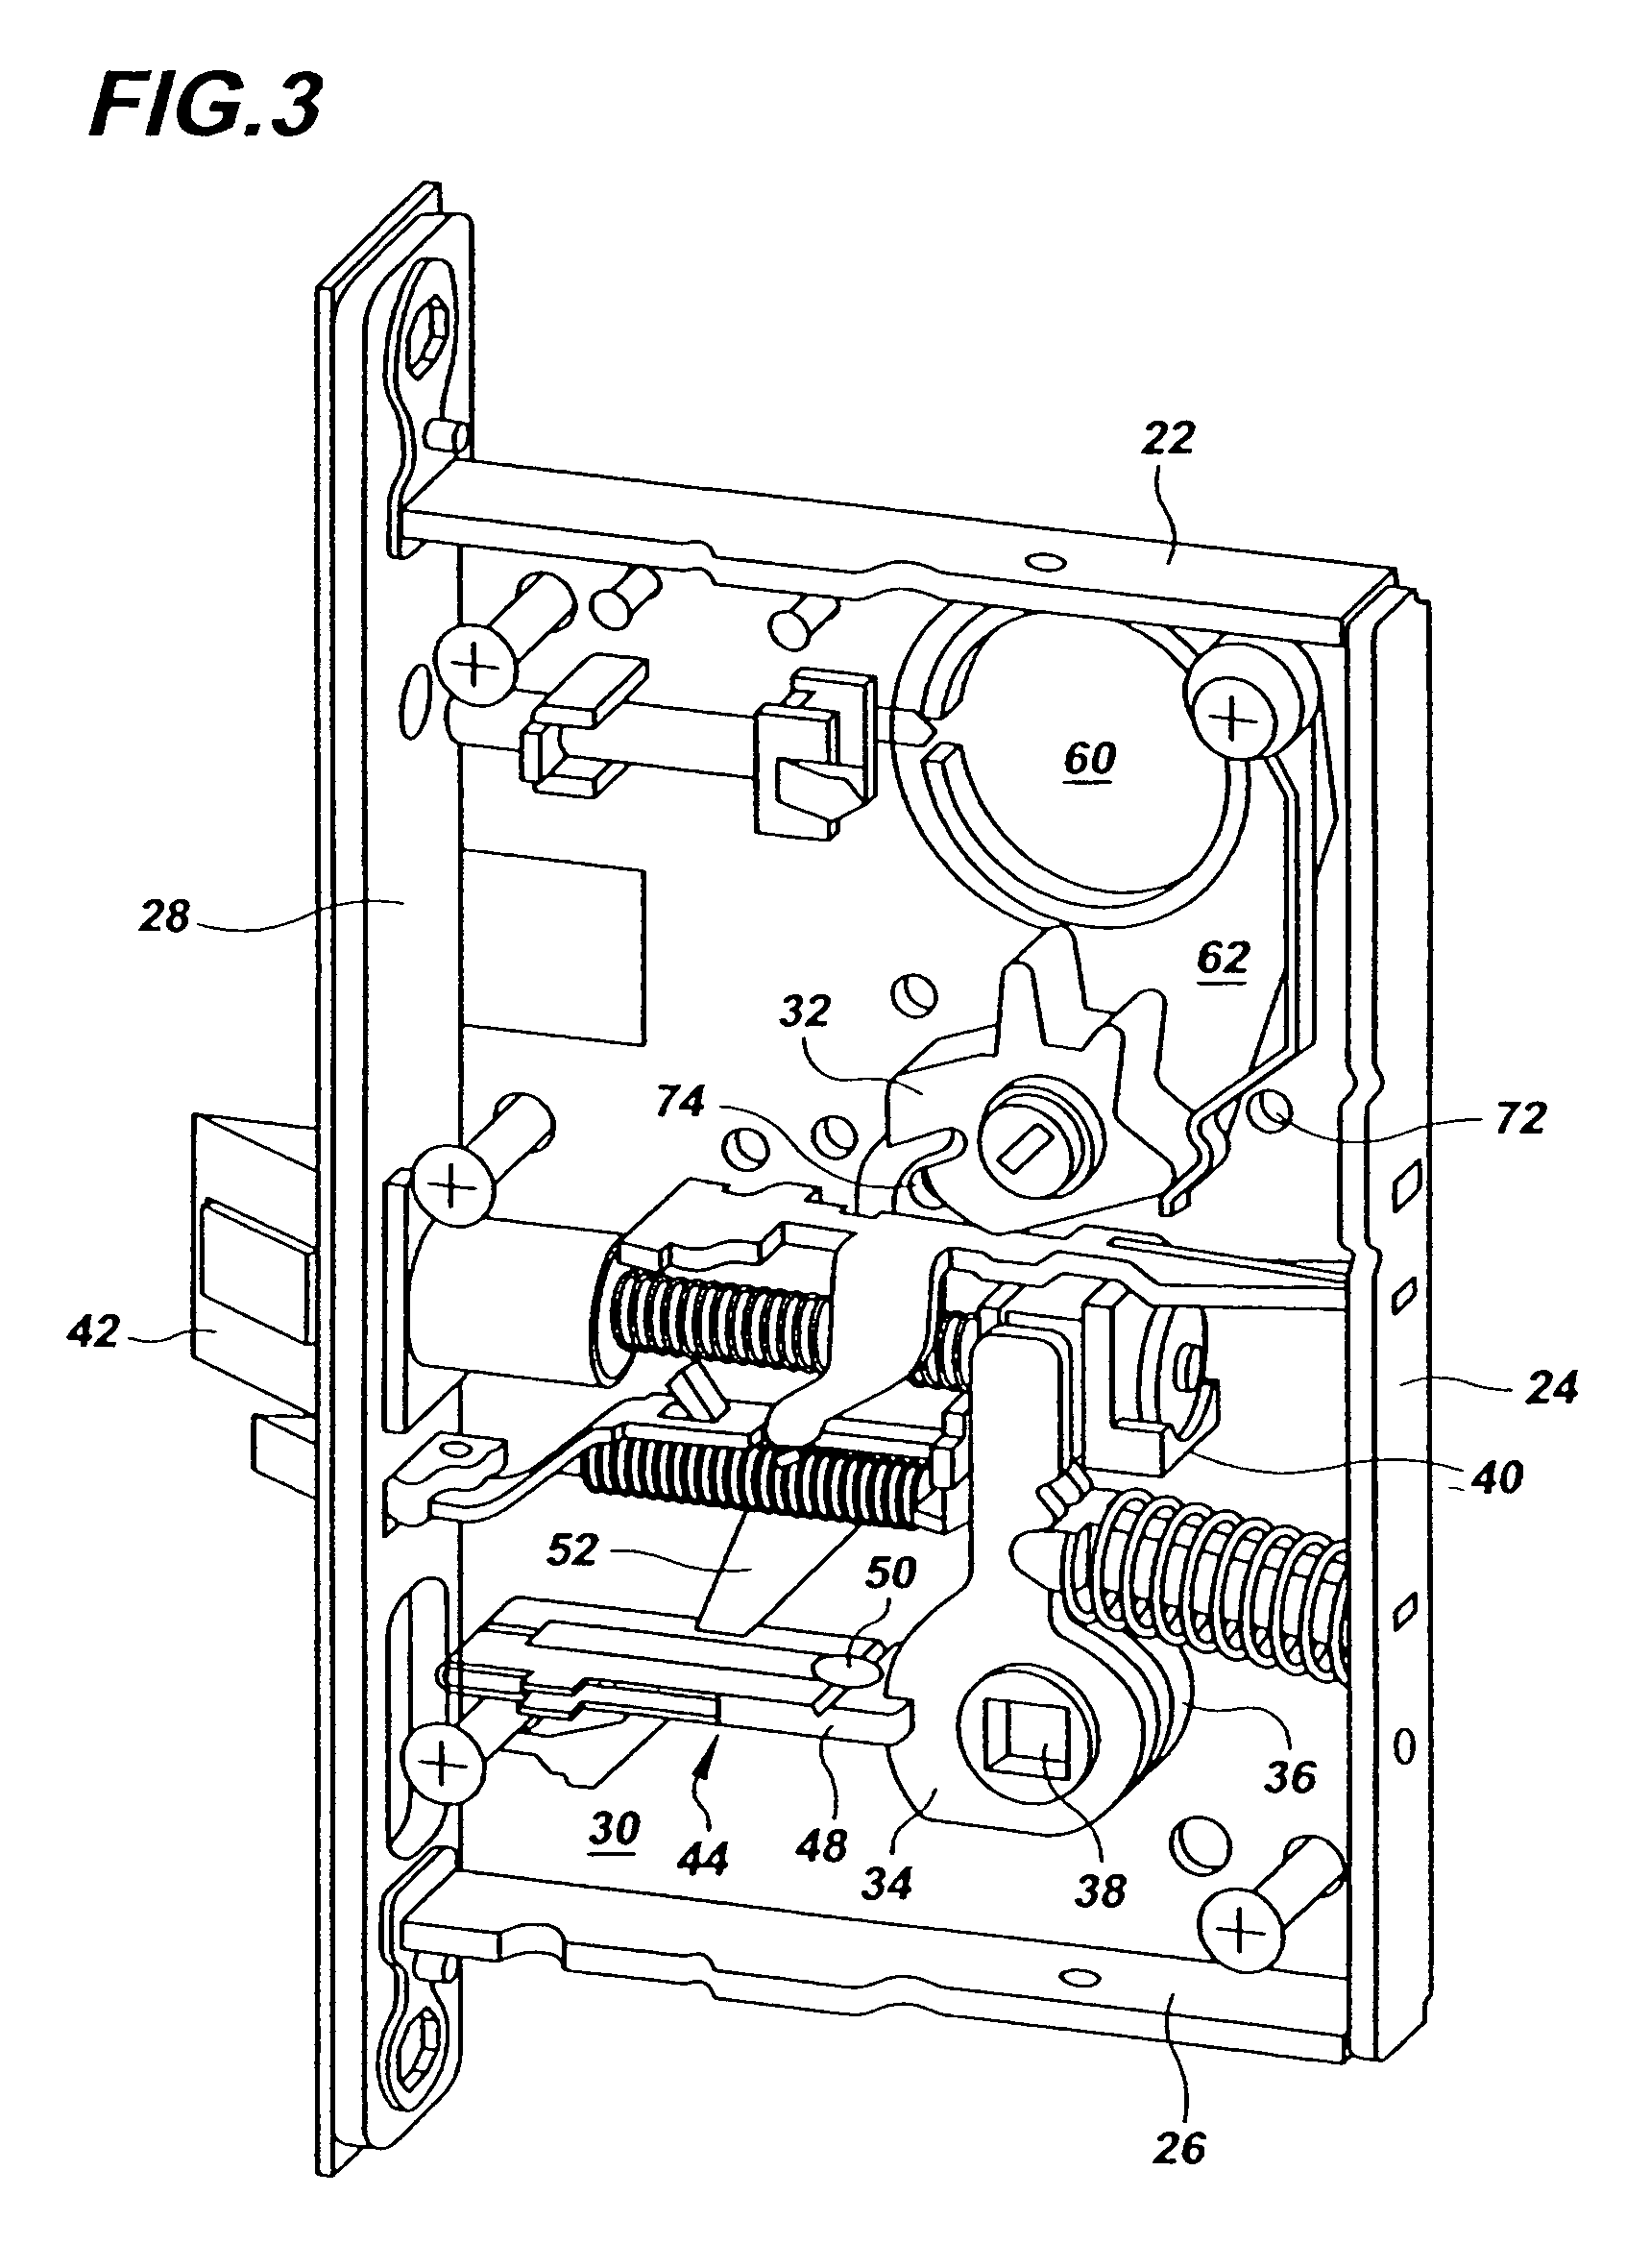 mortise lock parts diagram 700r4 4x4 transmission patent us7188870 multi functional google